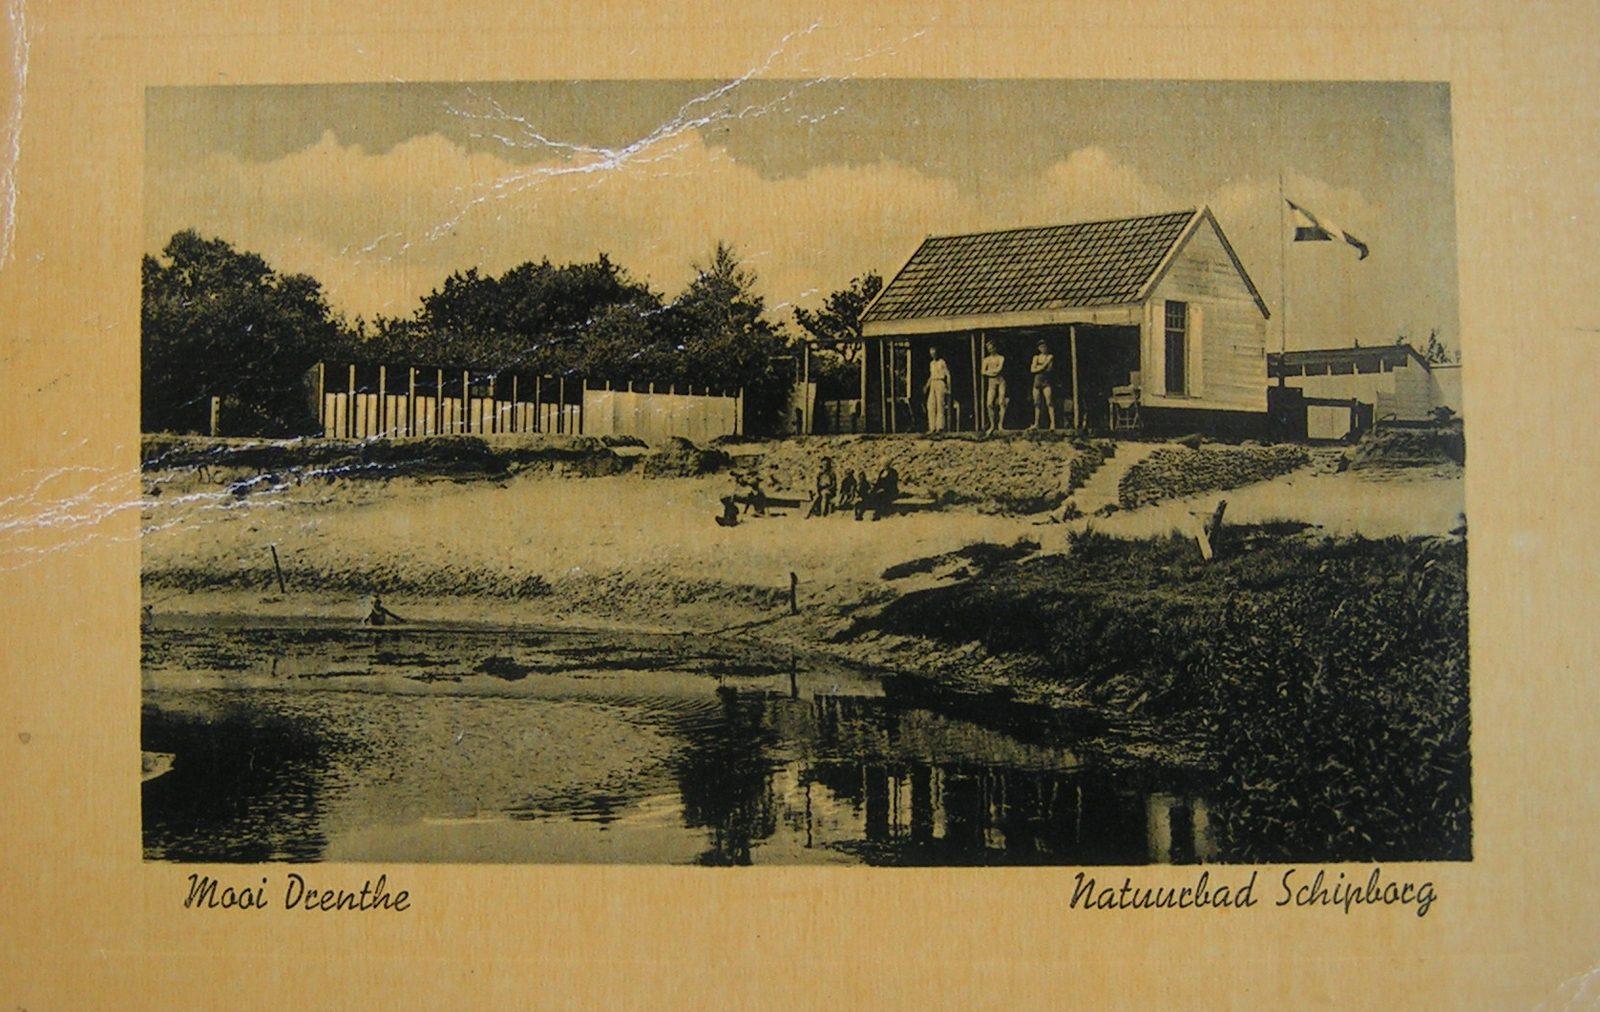 Begin jaren dertig zwembad met badhokjes Schipborg Músarrindill